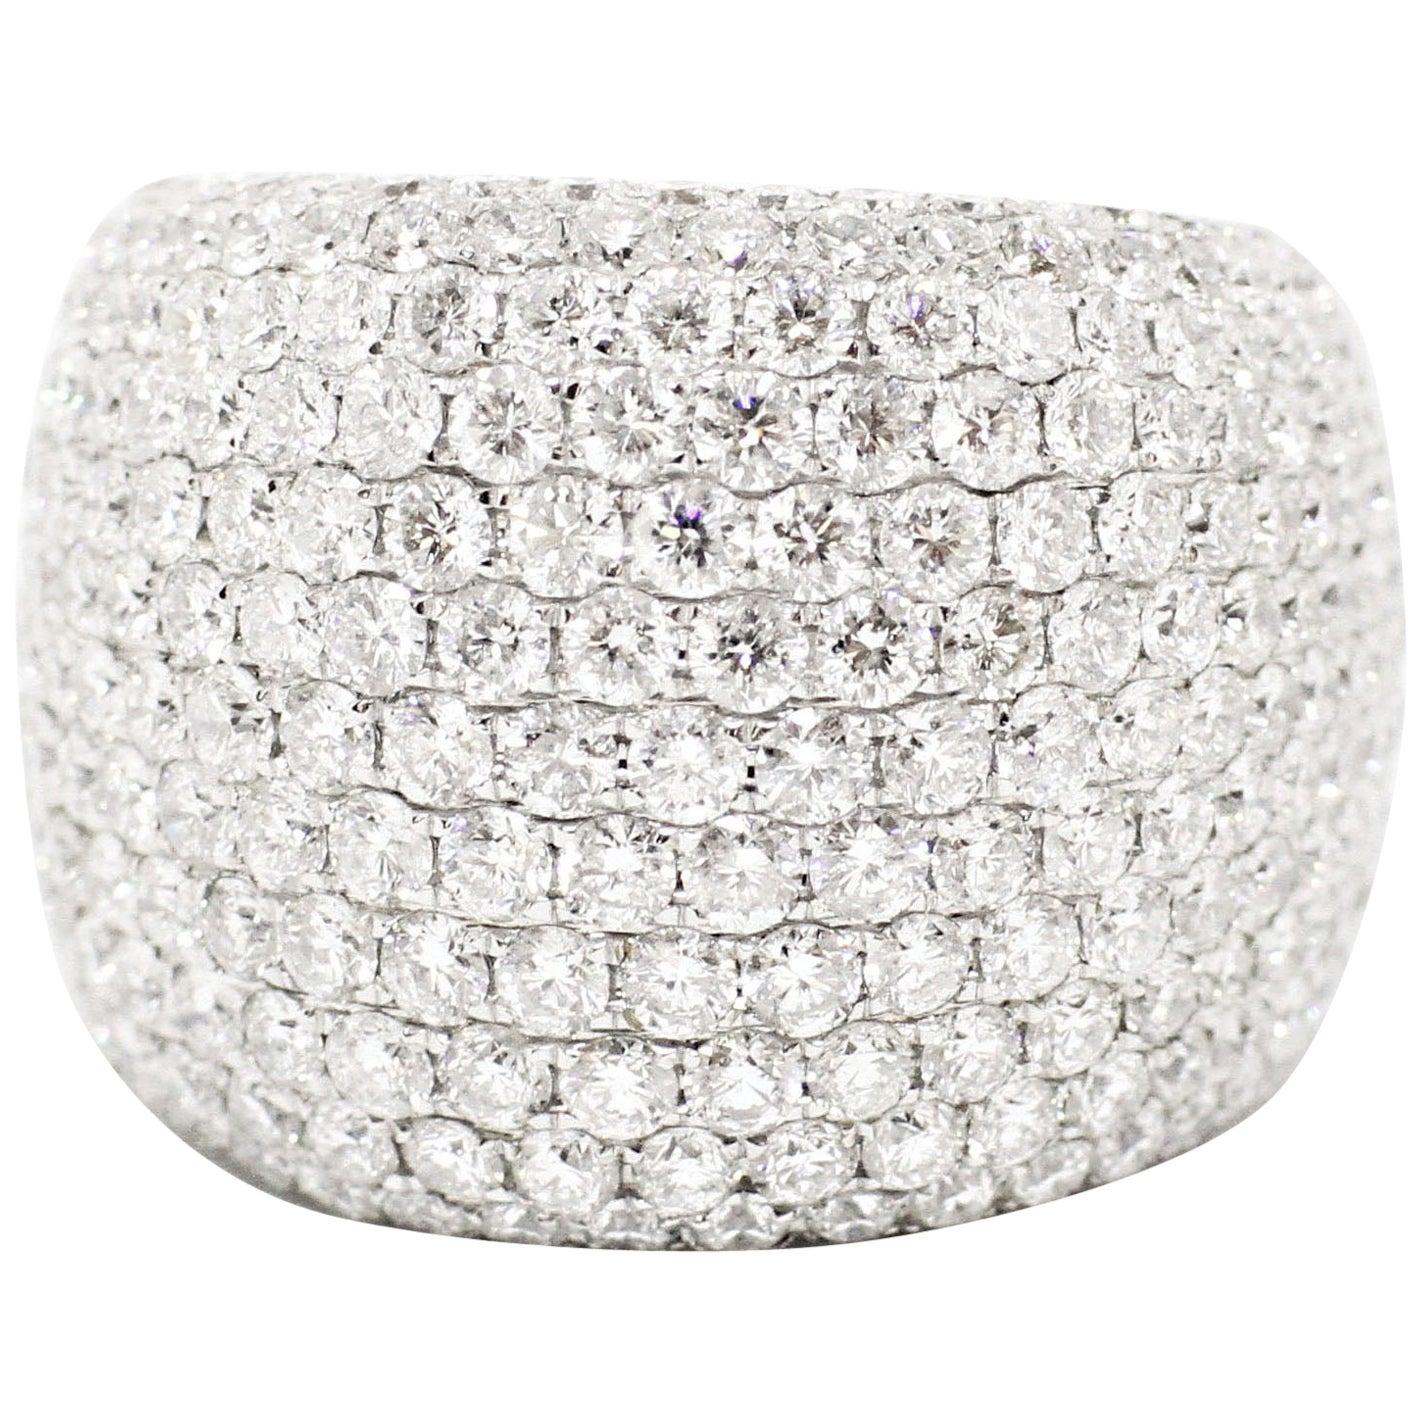 Diamond Bombé Dome Cluster 18 Carat White Gold Cocktail Ring